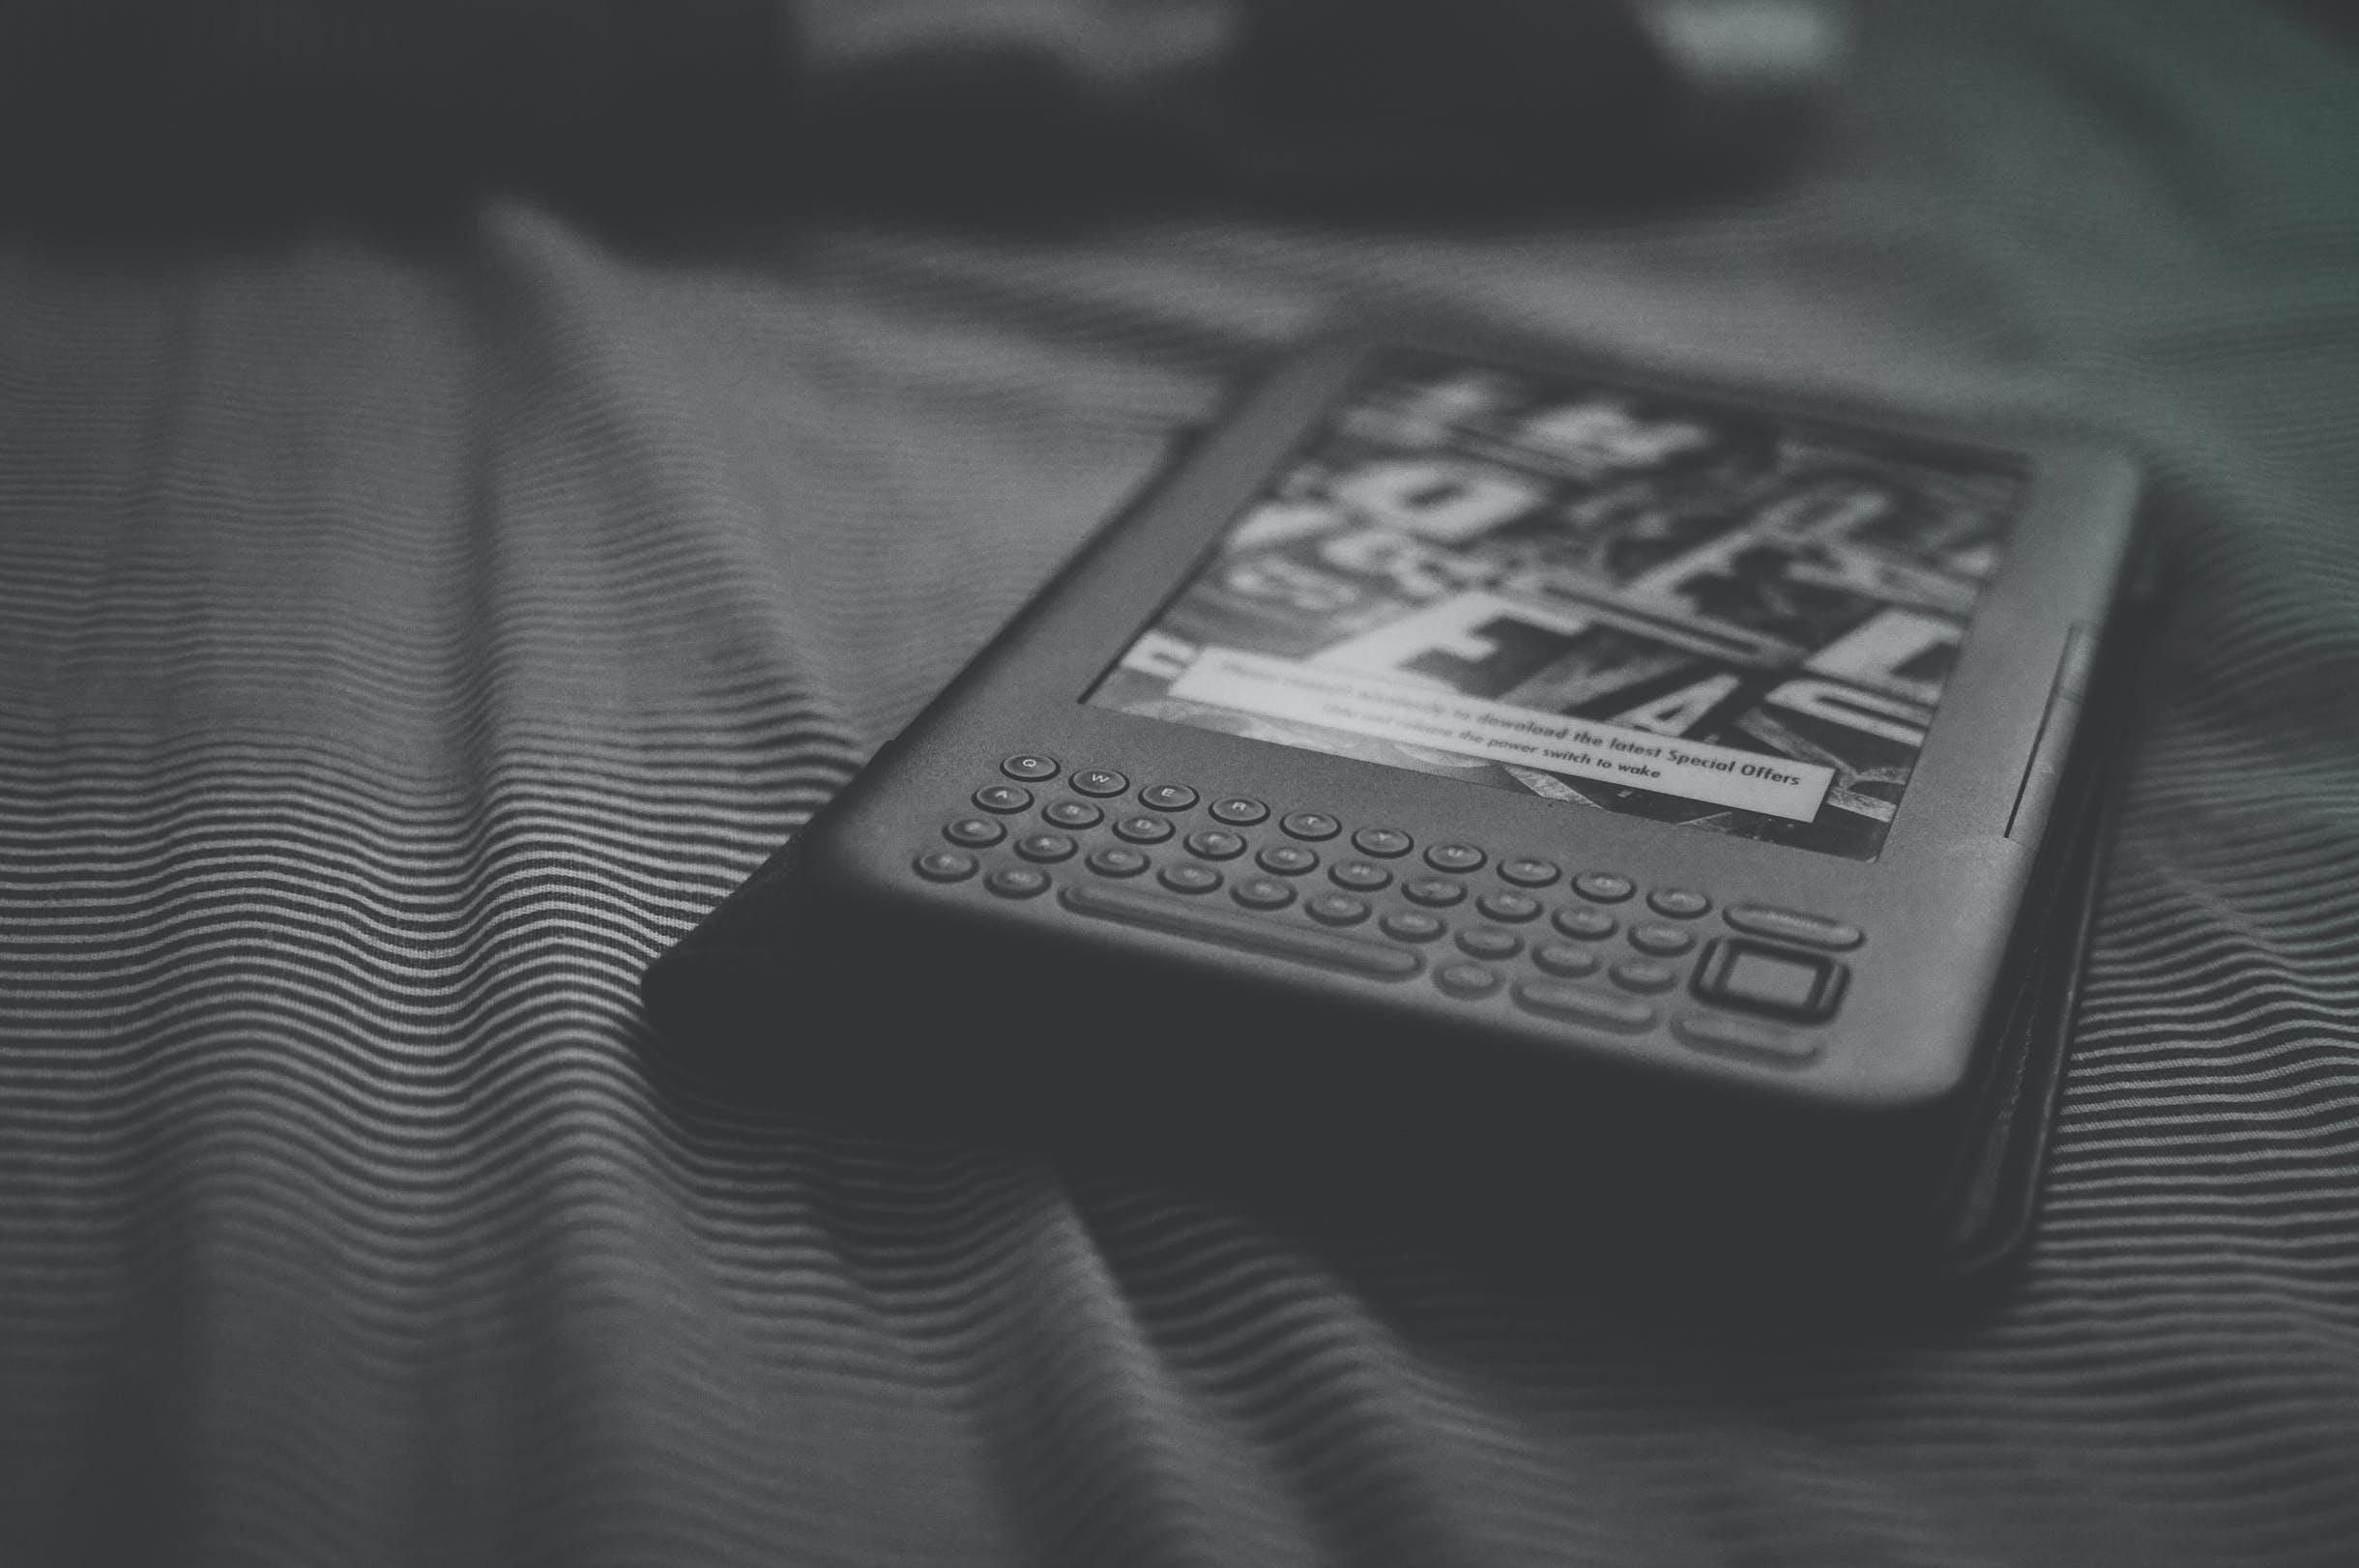 Grayscale Photo of E-reader